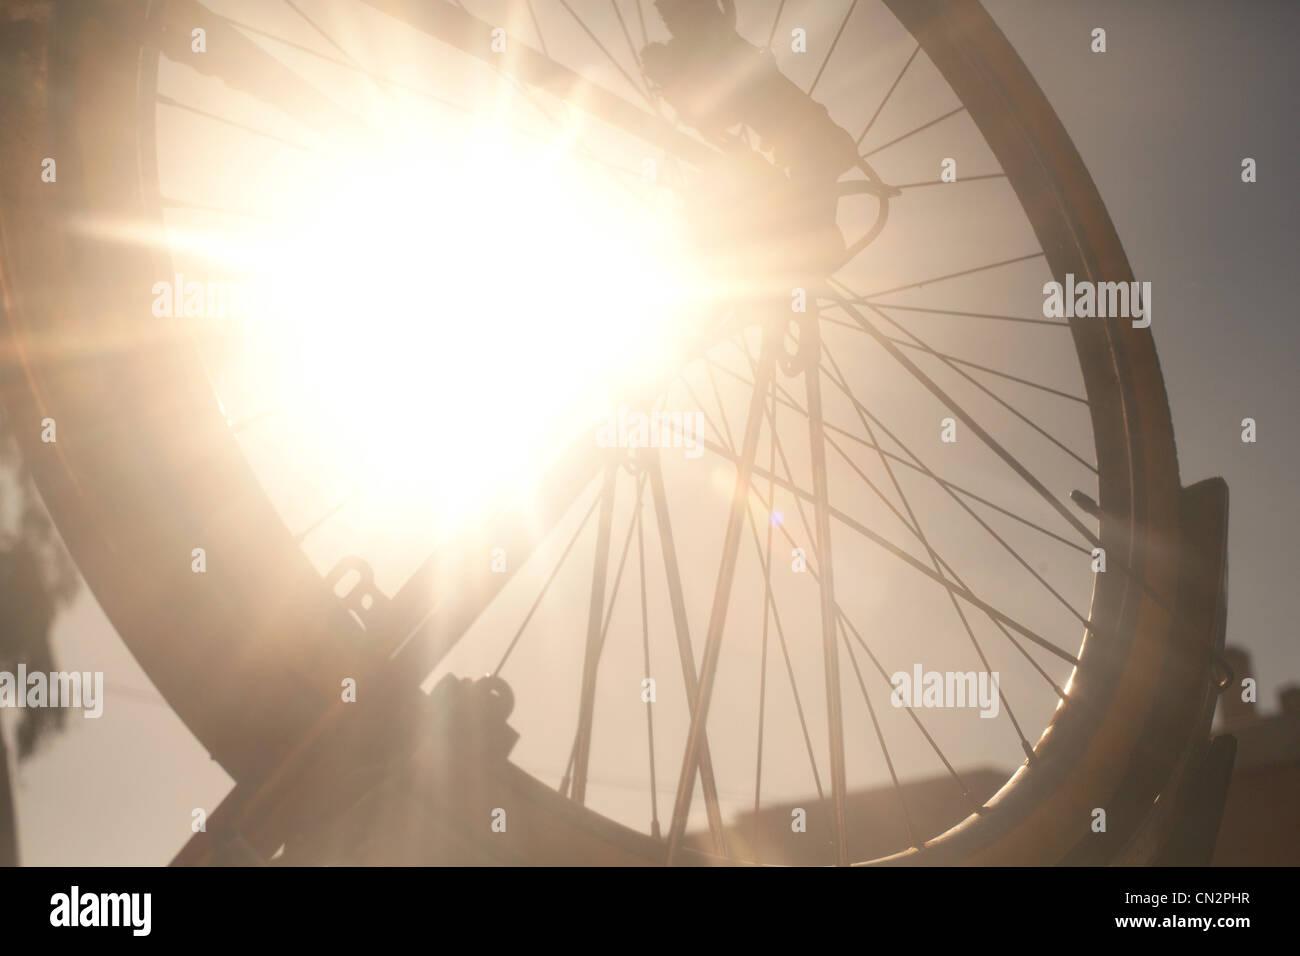 Roue de vélo en plein soleil Photo Stock